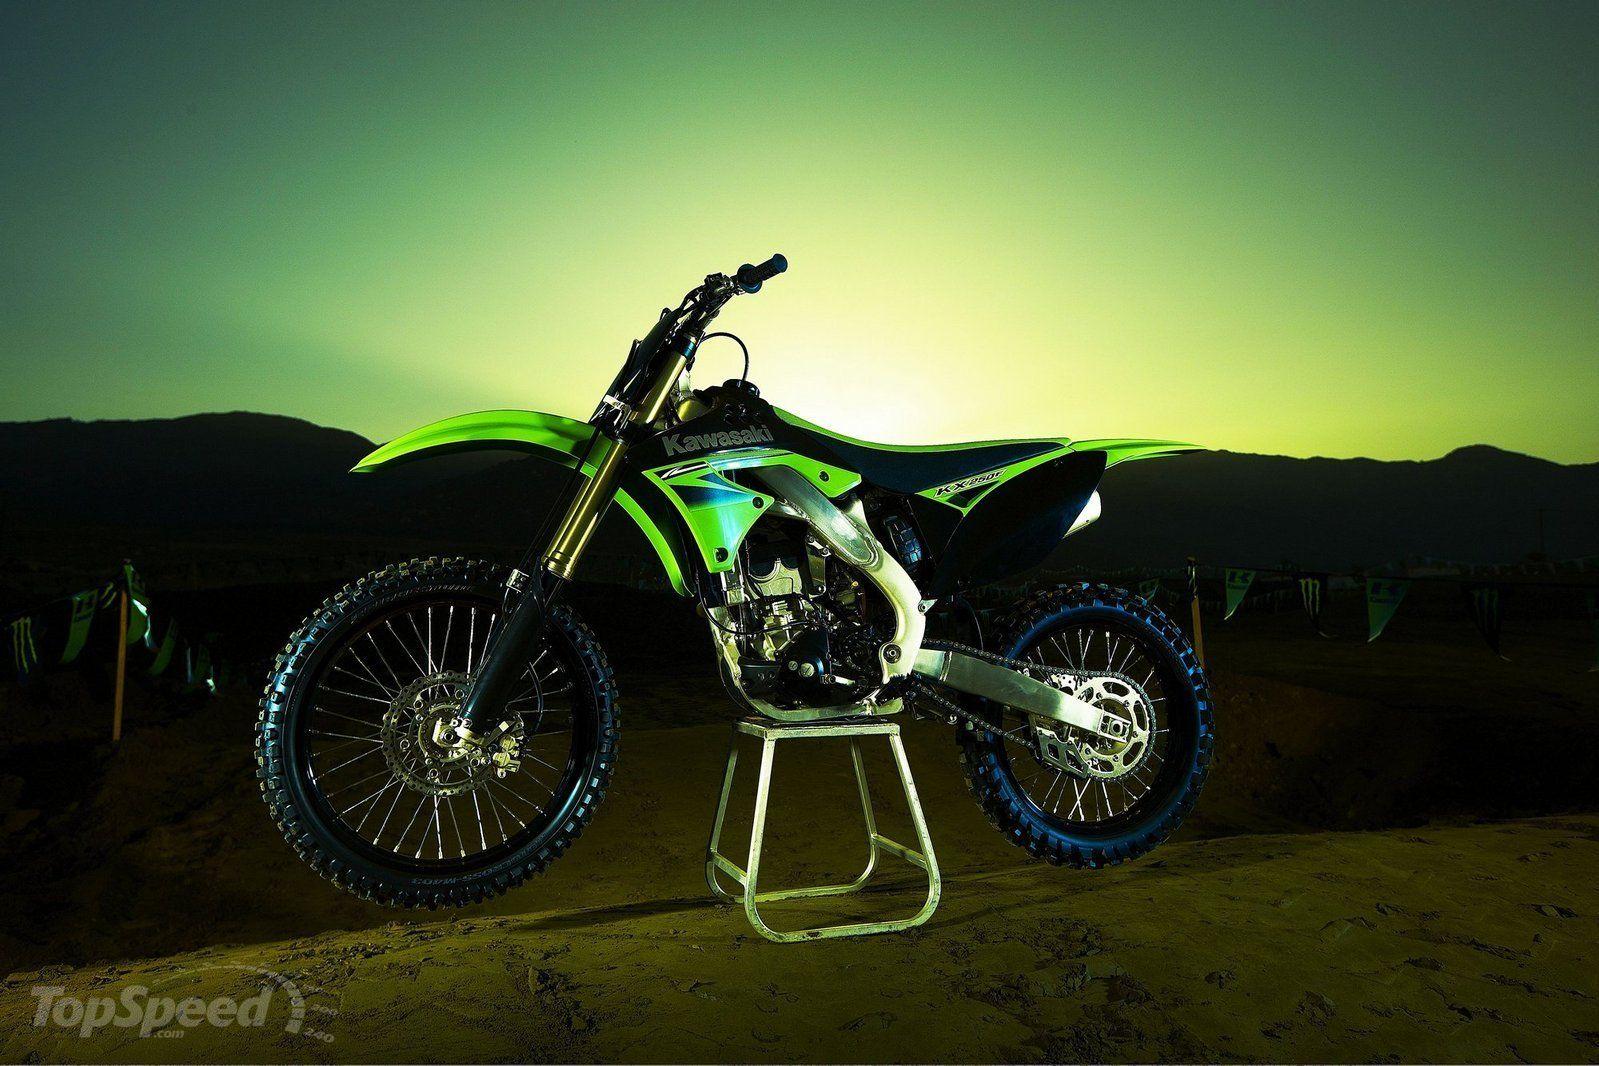 Kawasaki Bike Wallpaper HD for desktop Download Free Best